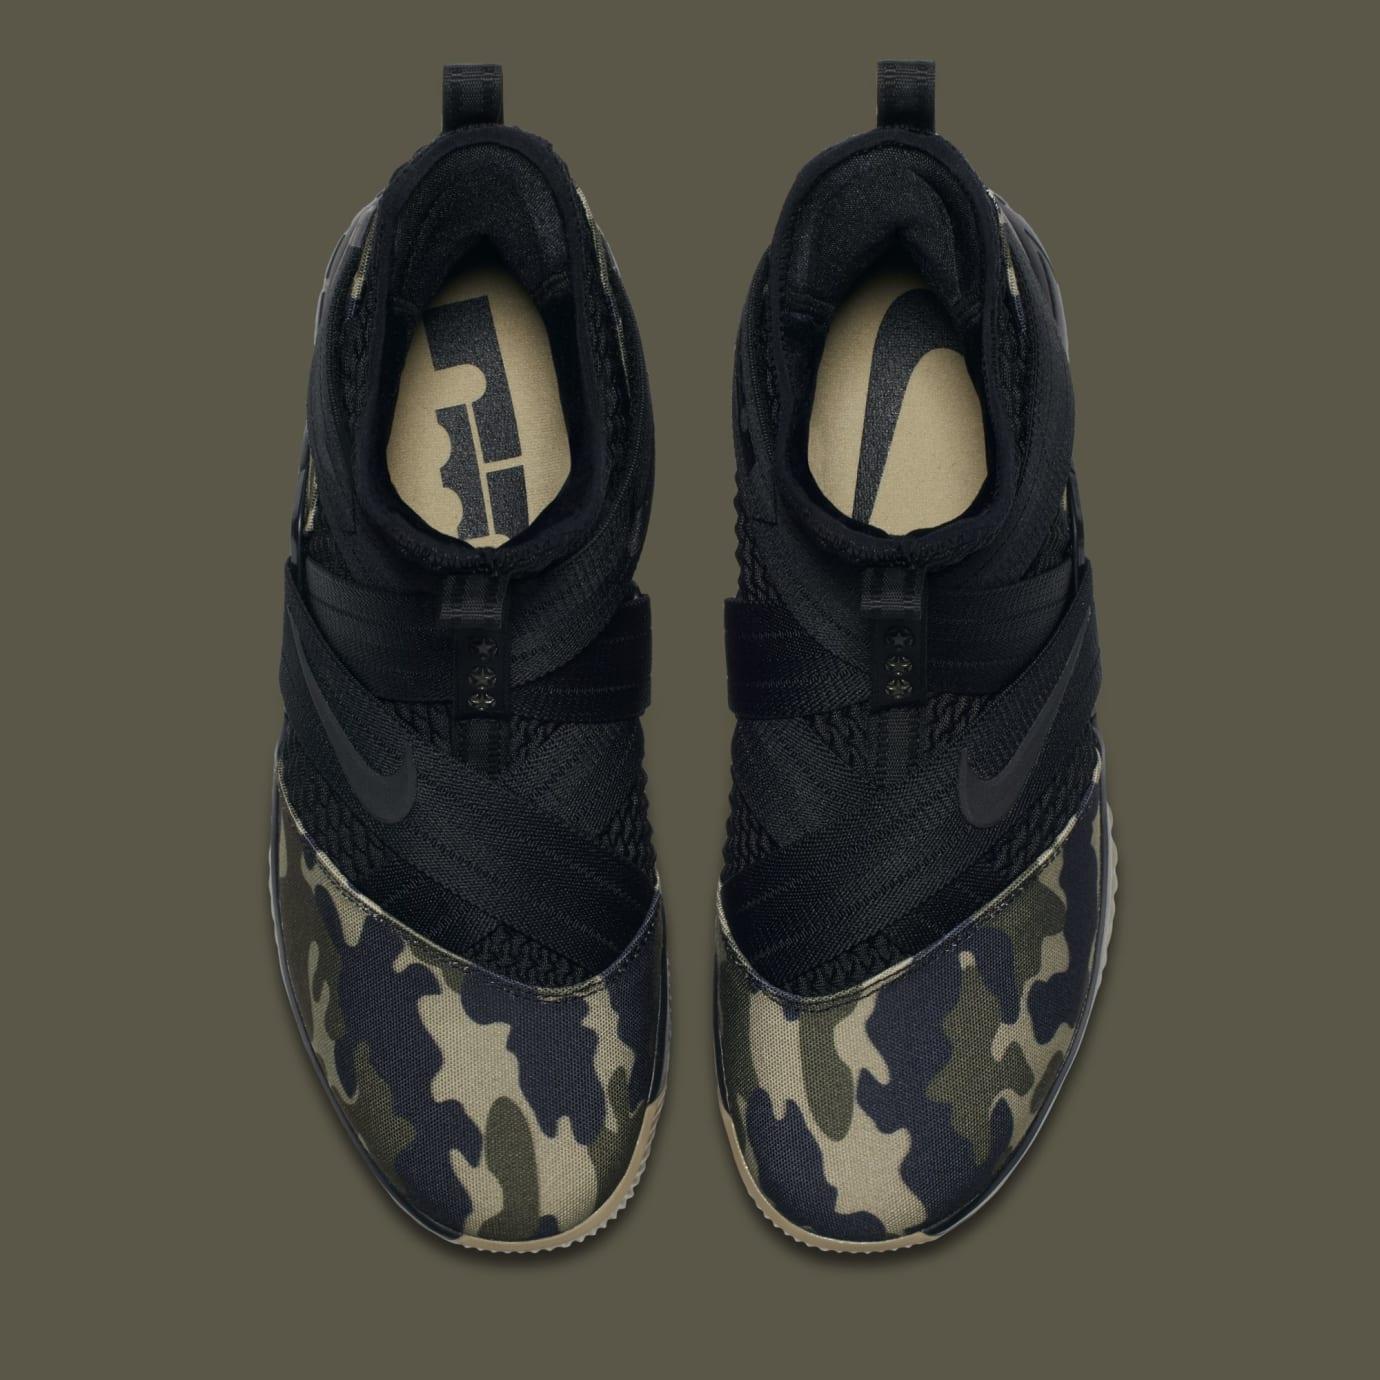 82183c1e2215 Image via Nike Nike LeBron Solider 12 SFG  Hazel Rush  AO4054-001 (Top)